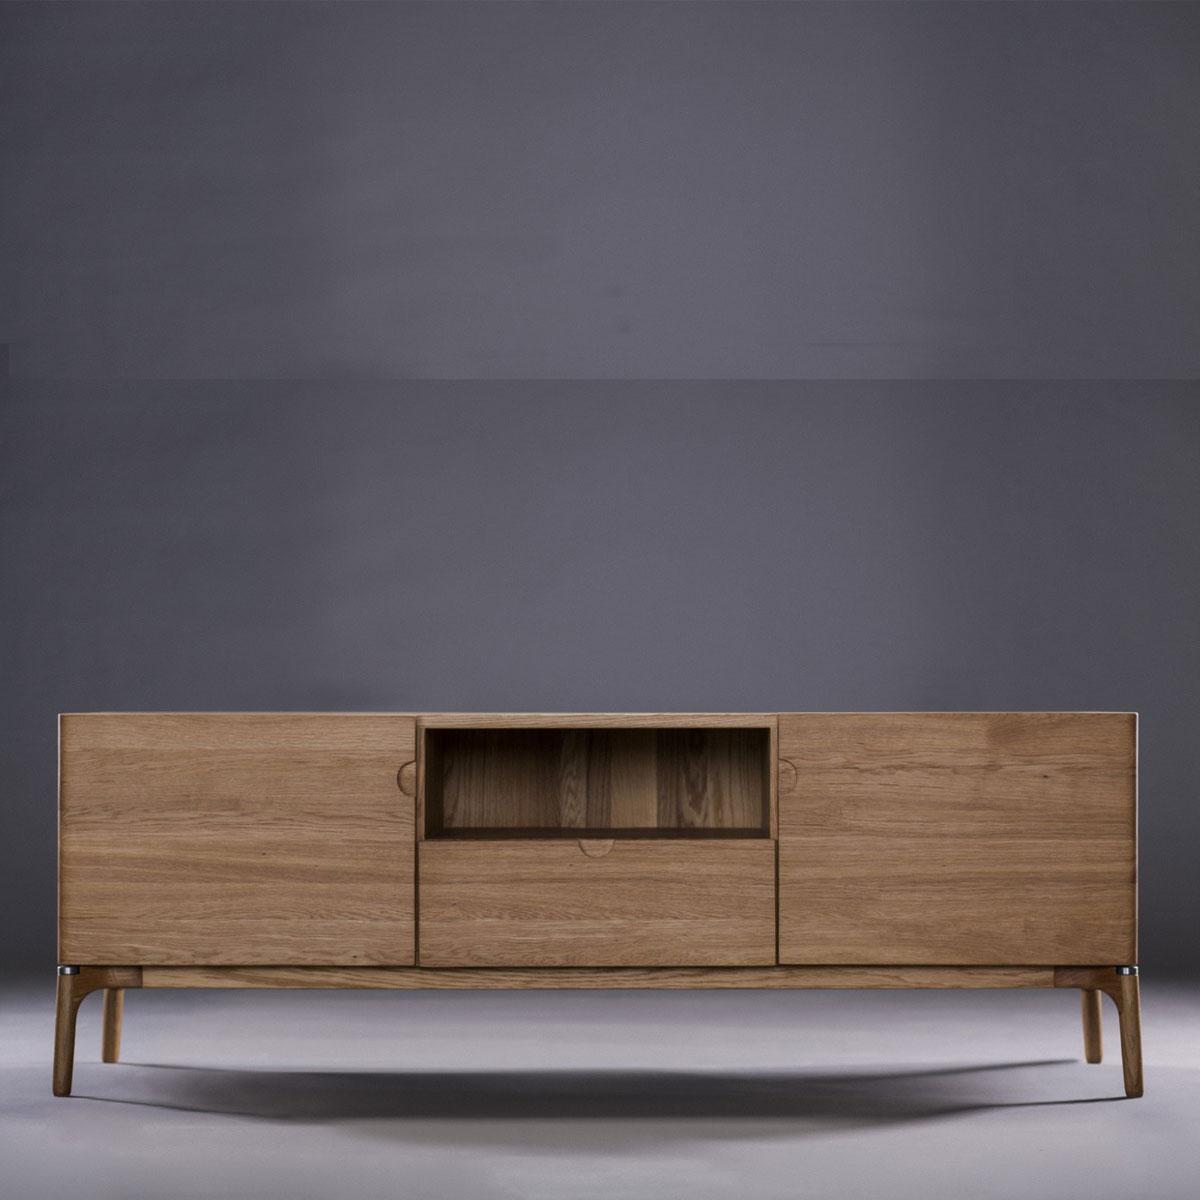 Aparador Naru en madera con cajones, puertas y compartimento, de producción artesana moderna en Europa para Artisan